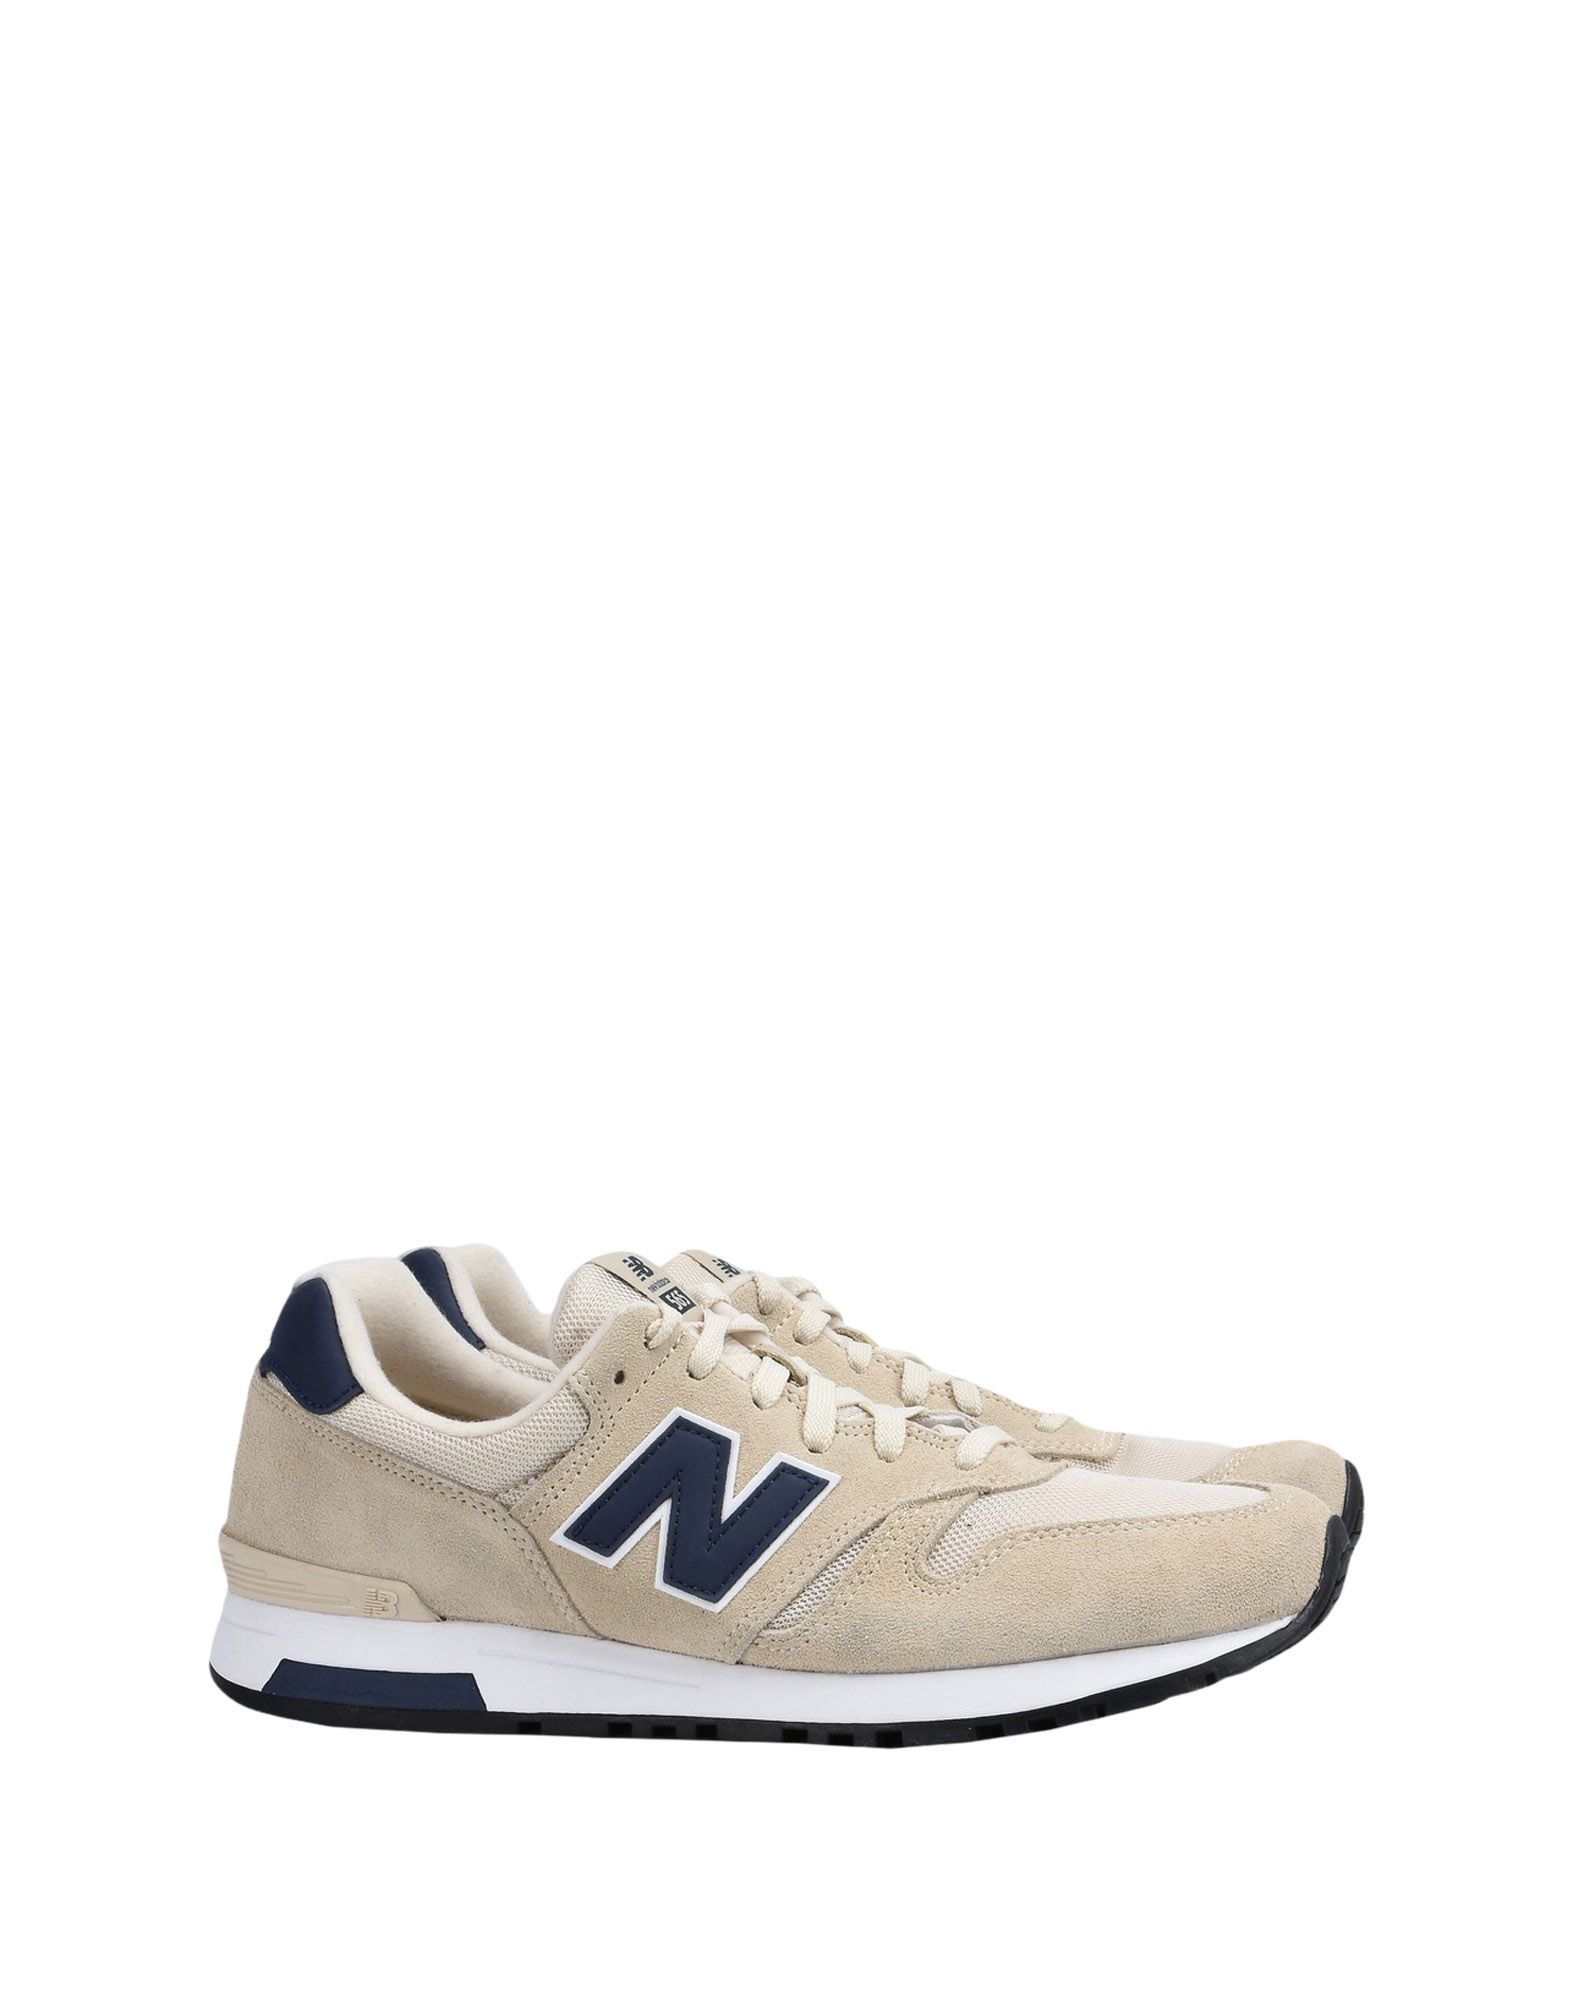 Rabatt echte Schuhe New Balance 565 Suede/Mesh  11341723TF 11341723TF 11341723TF 0c00e0